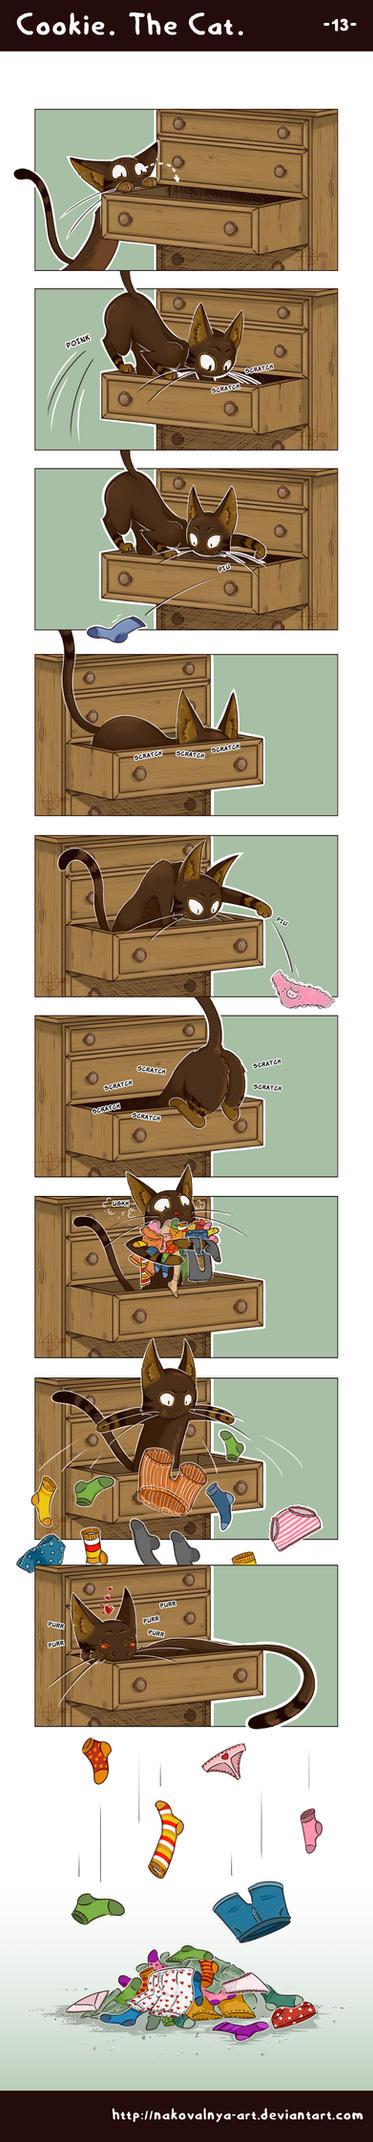 Cookie. The Cat. -- 13 -- by nakovalnya-artist